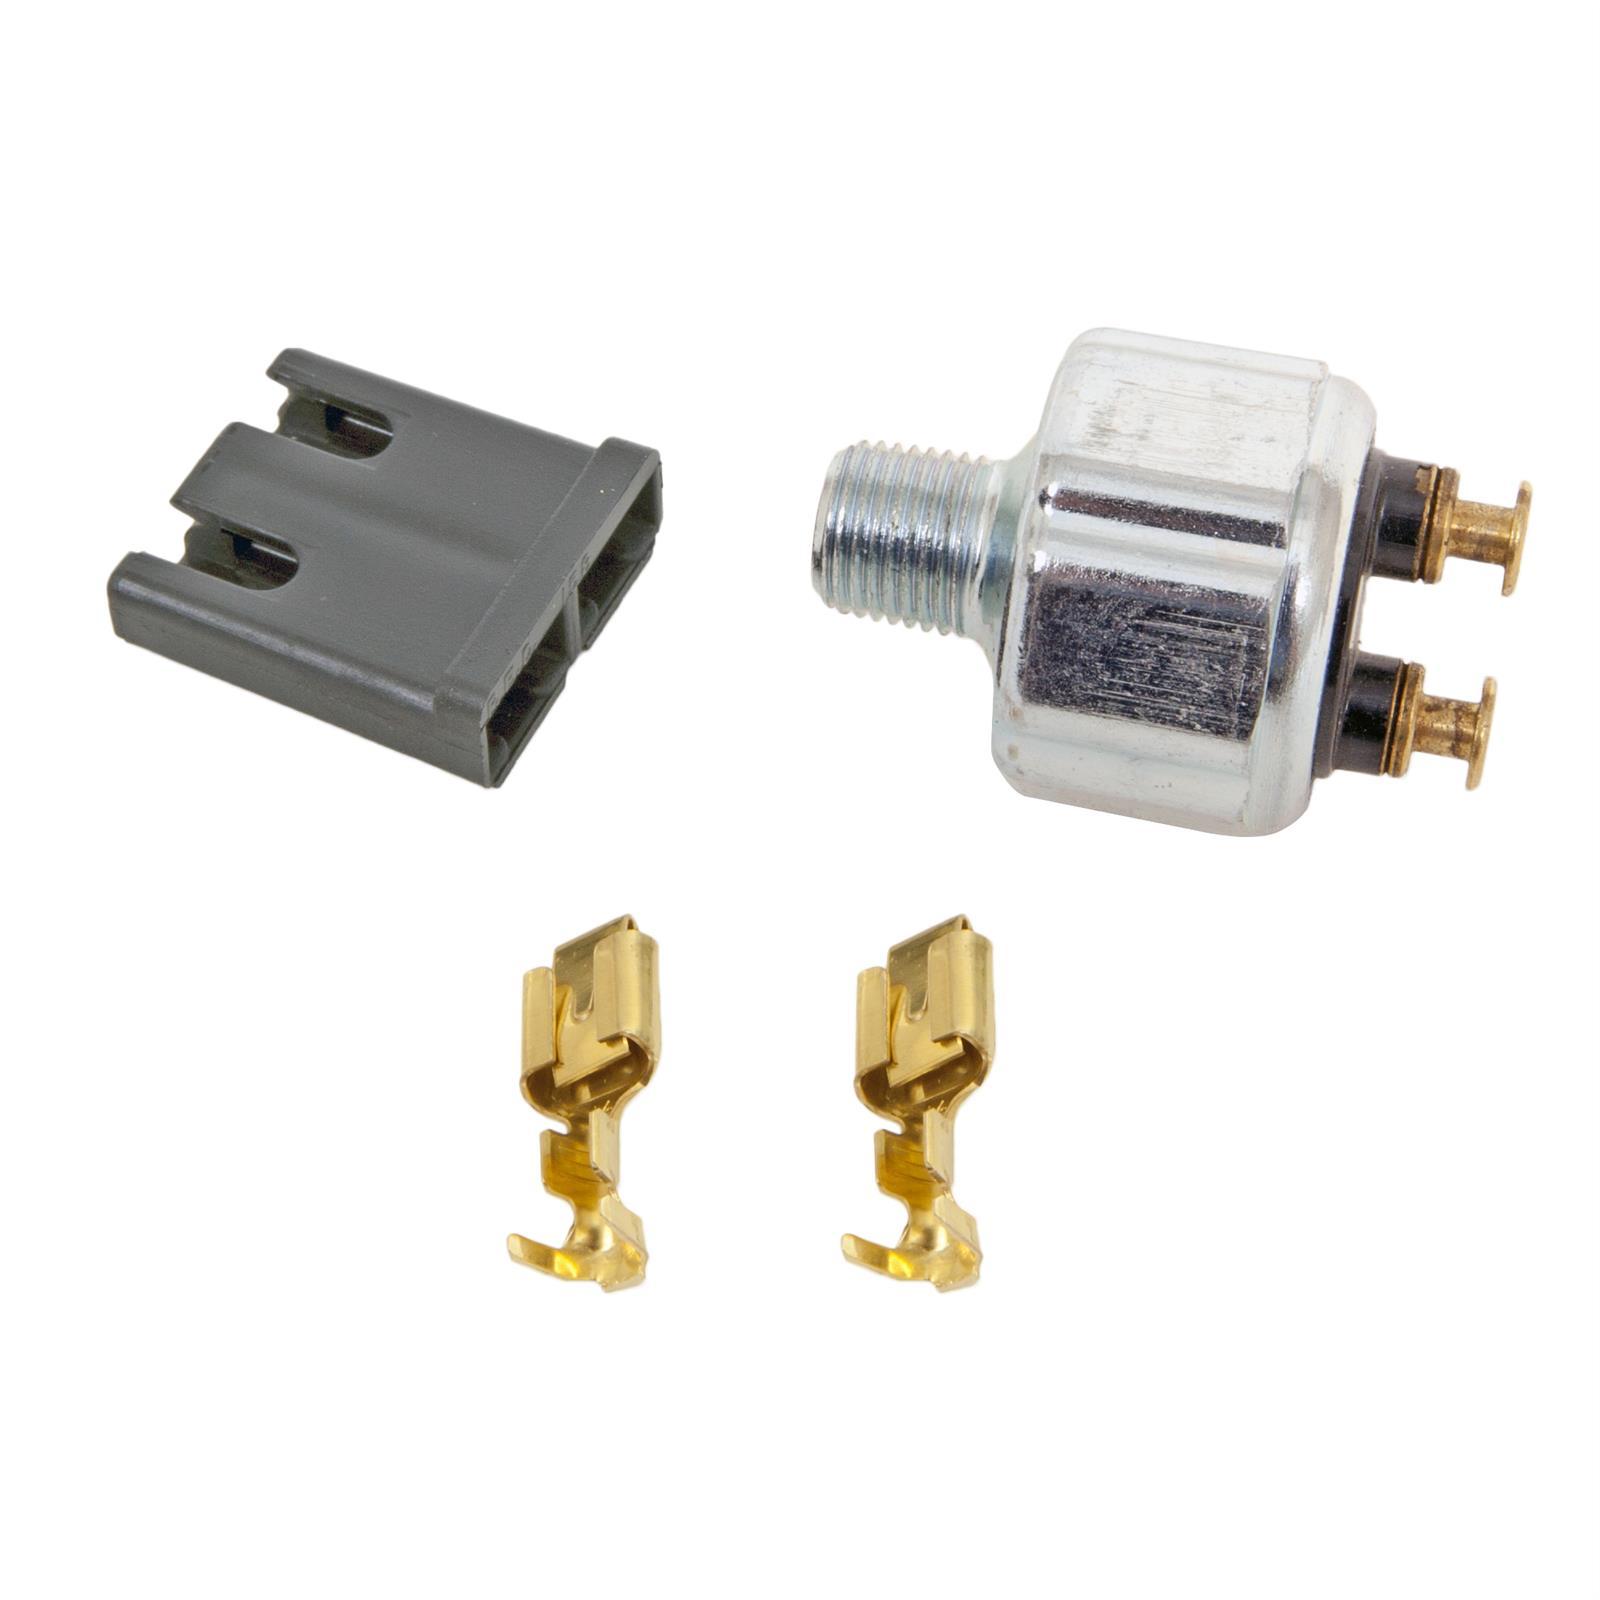 Hydraulic Pressure Safety : Ron francis sw hydraulic brake switch low pressure each